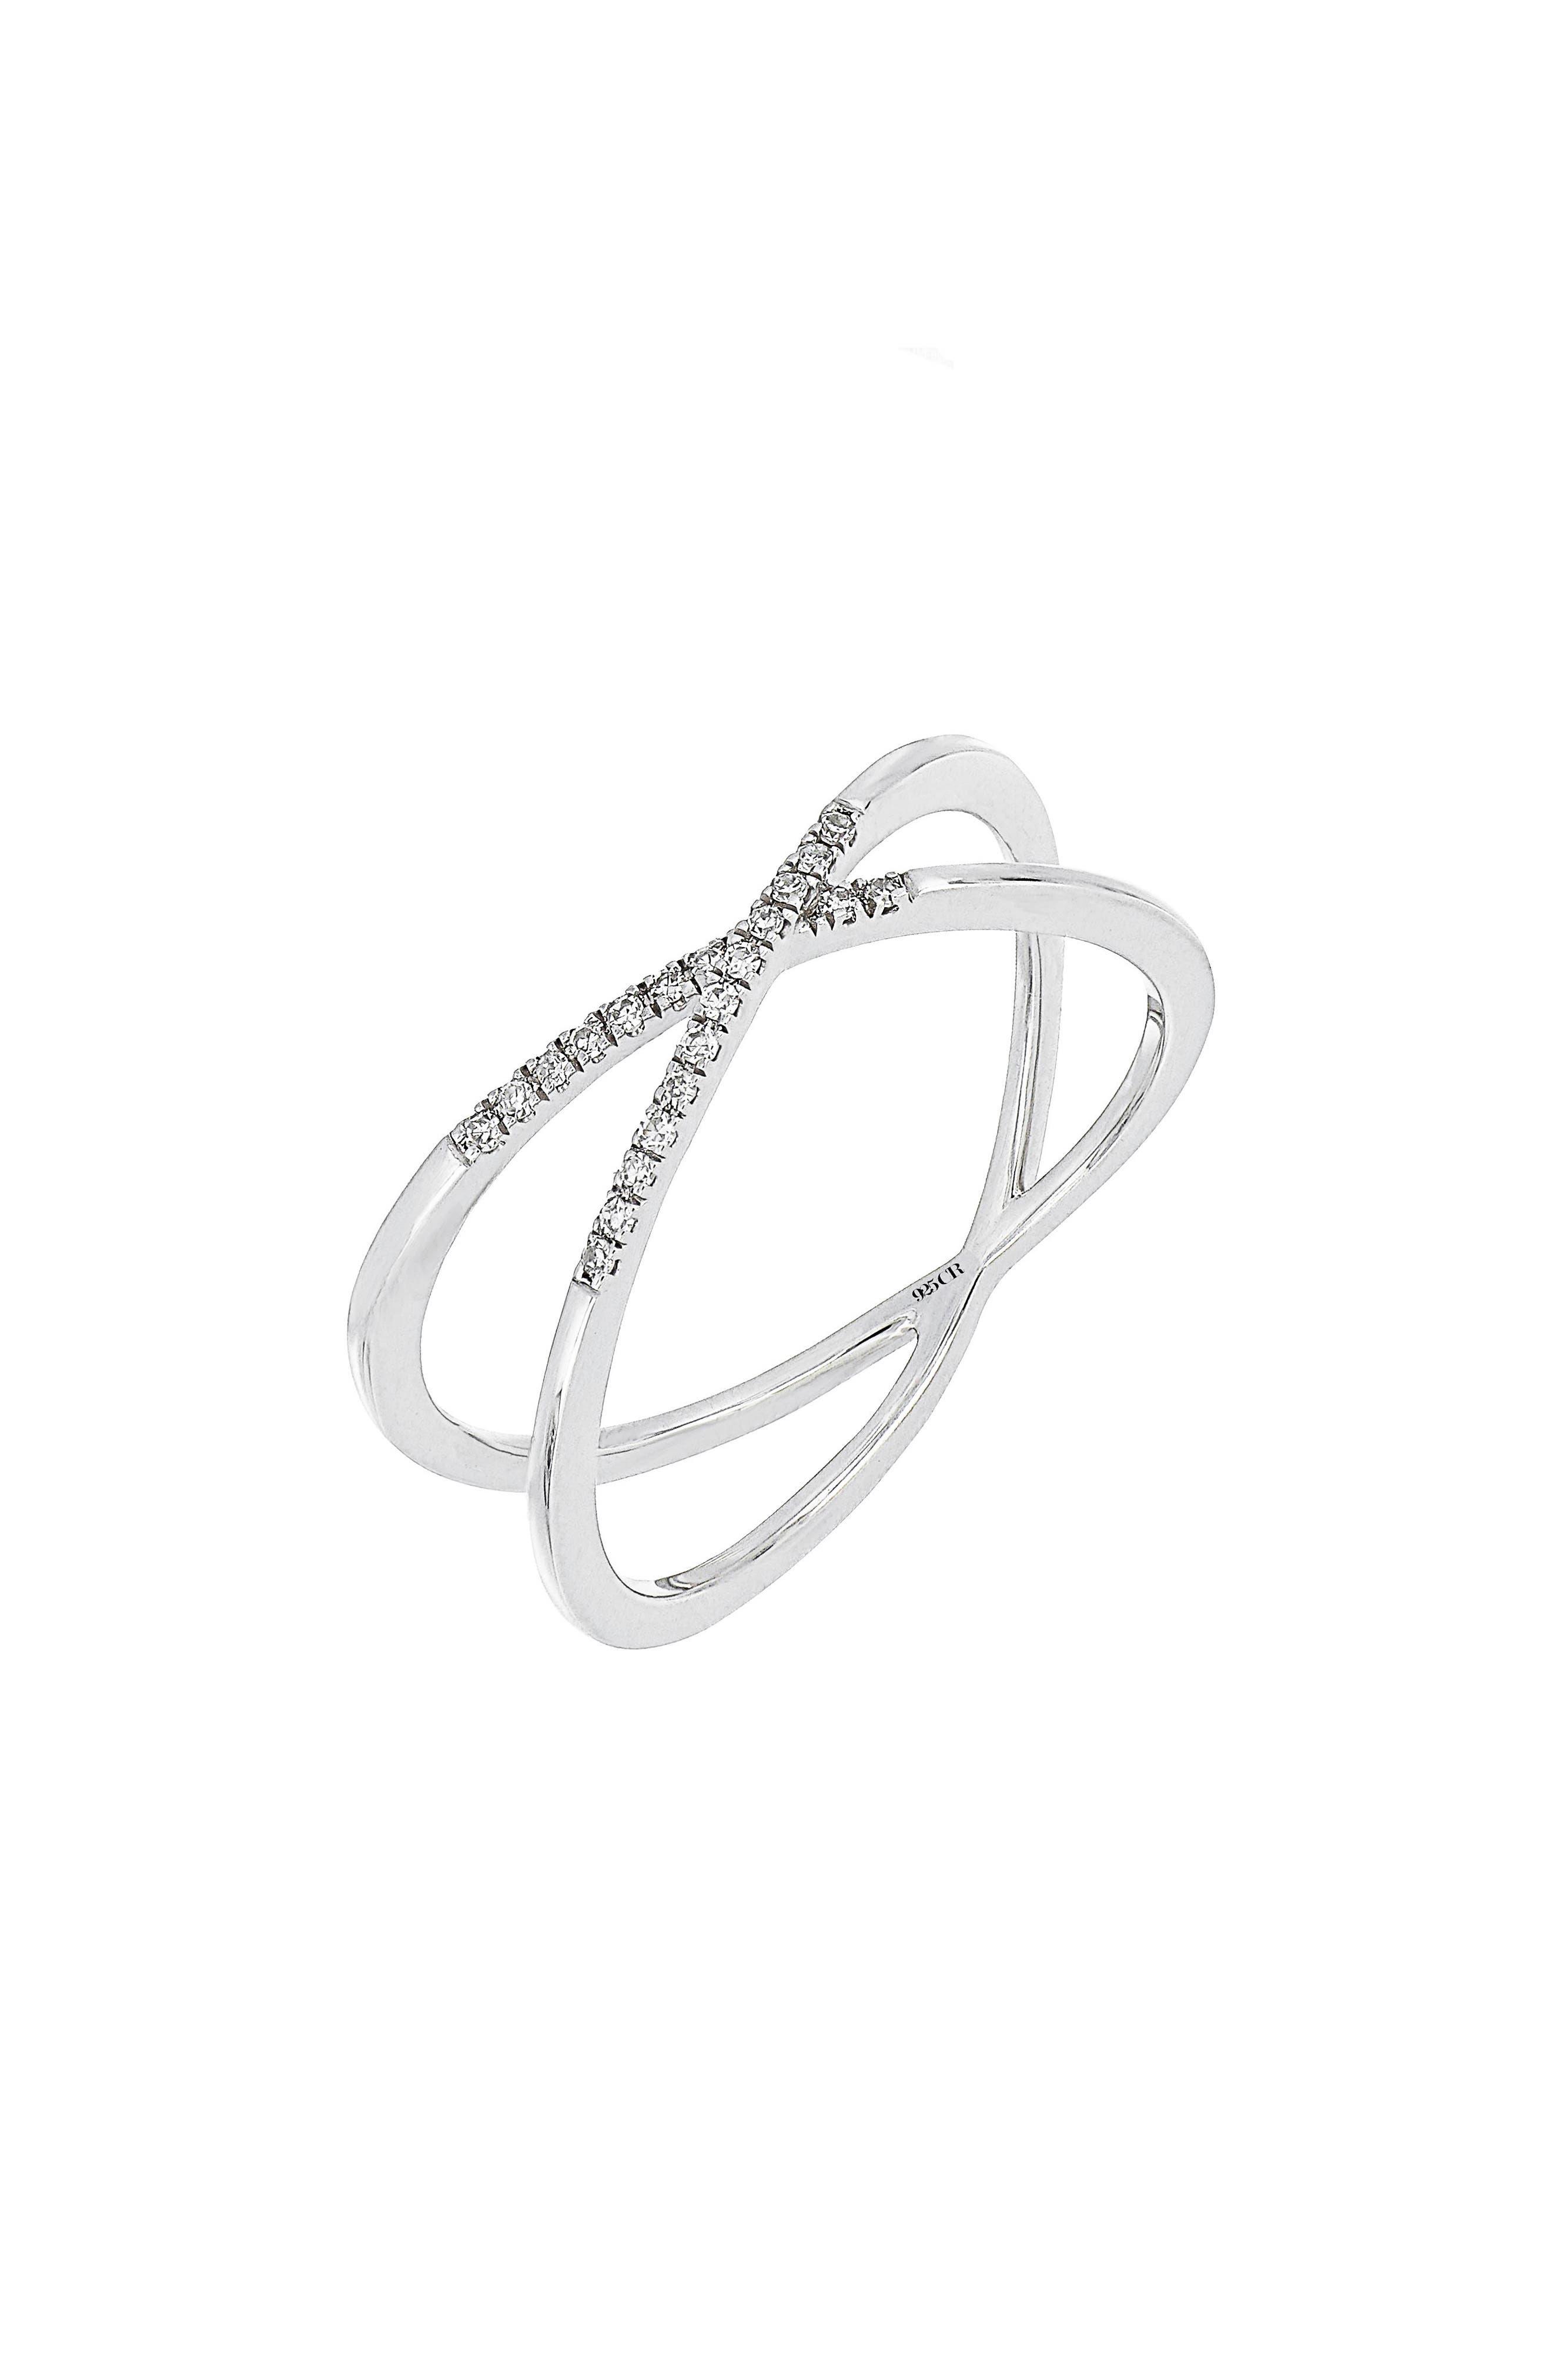 Carrière Crisscross Diamond Ring,                         Main,                         color, 040